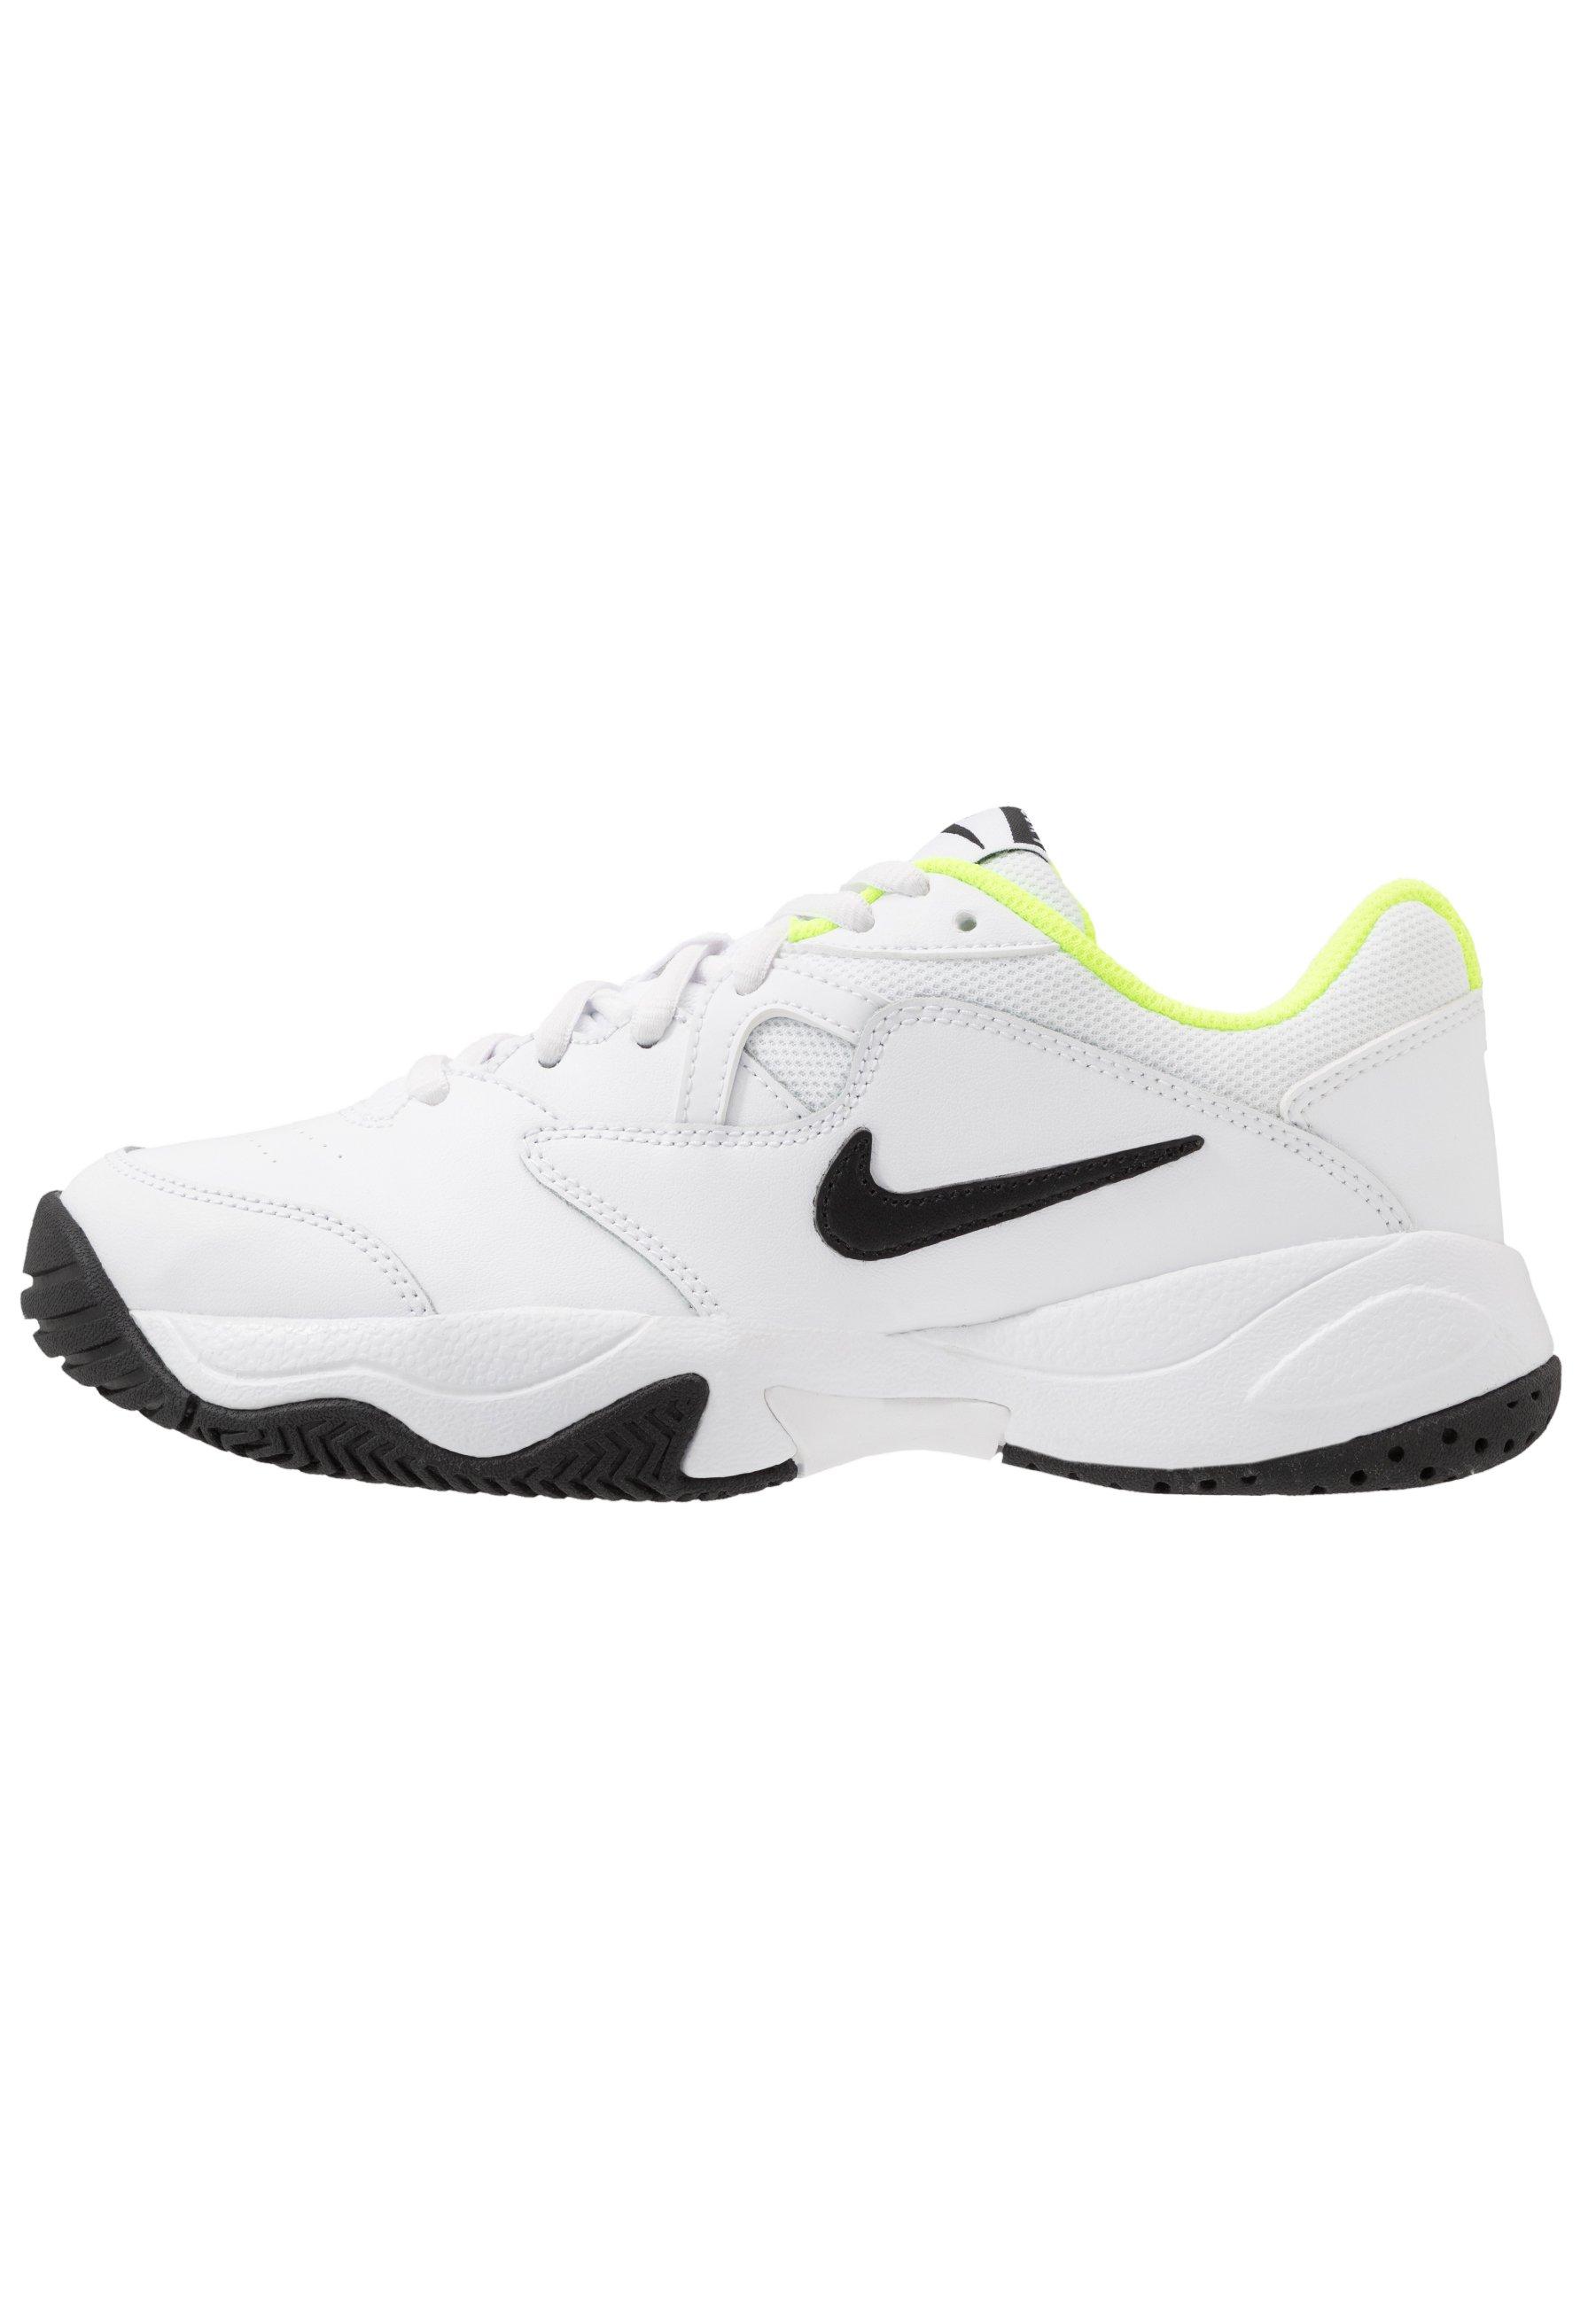 nike chaussures de tennis